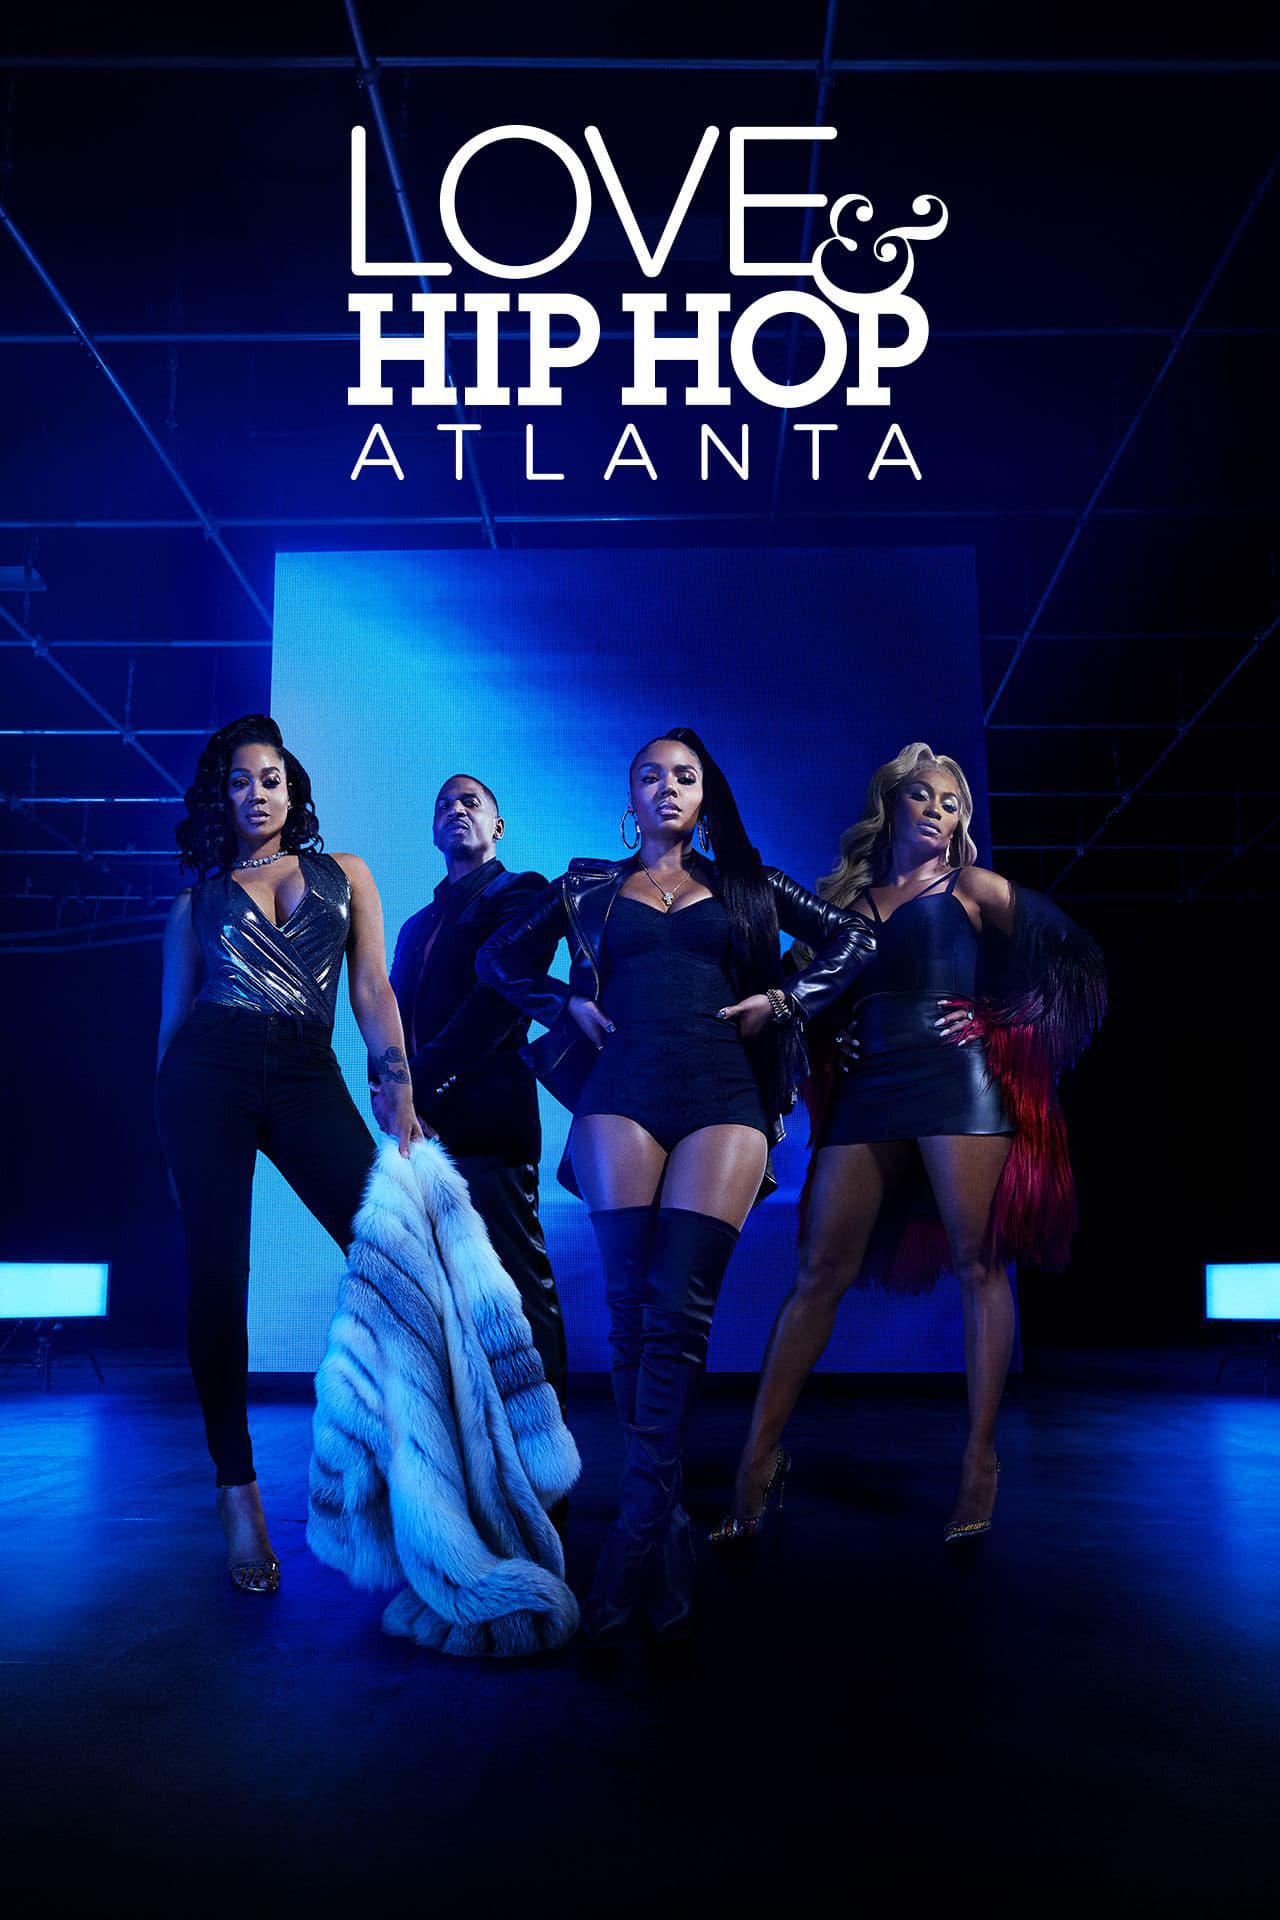 Love & Hip Hop Atlanta poster